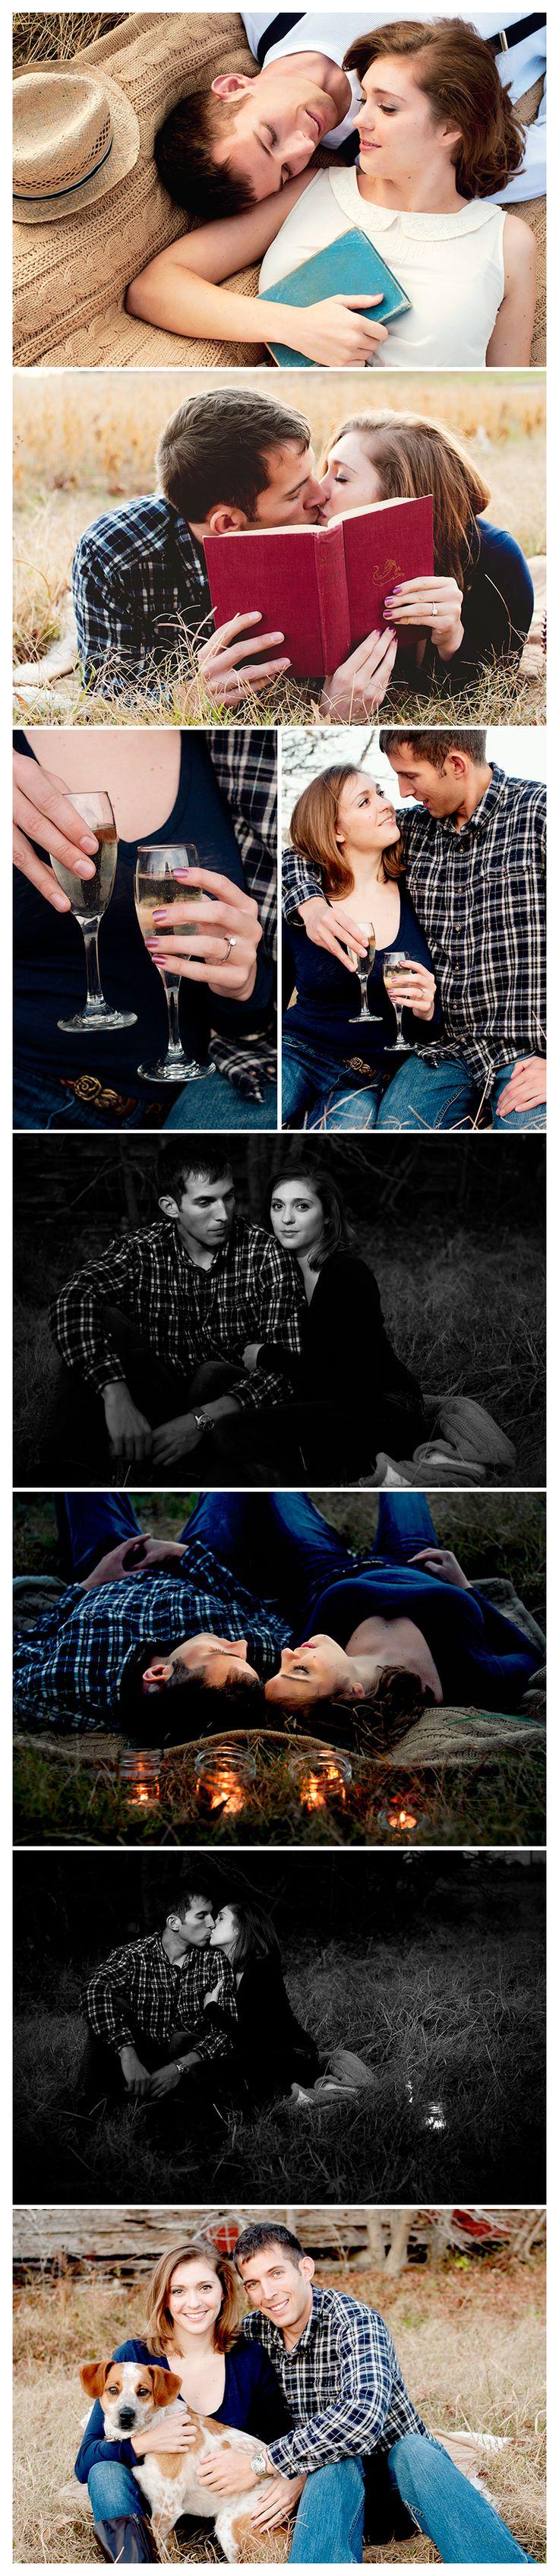 best couplesengagement photography images on pinterest